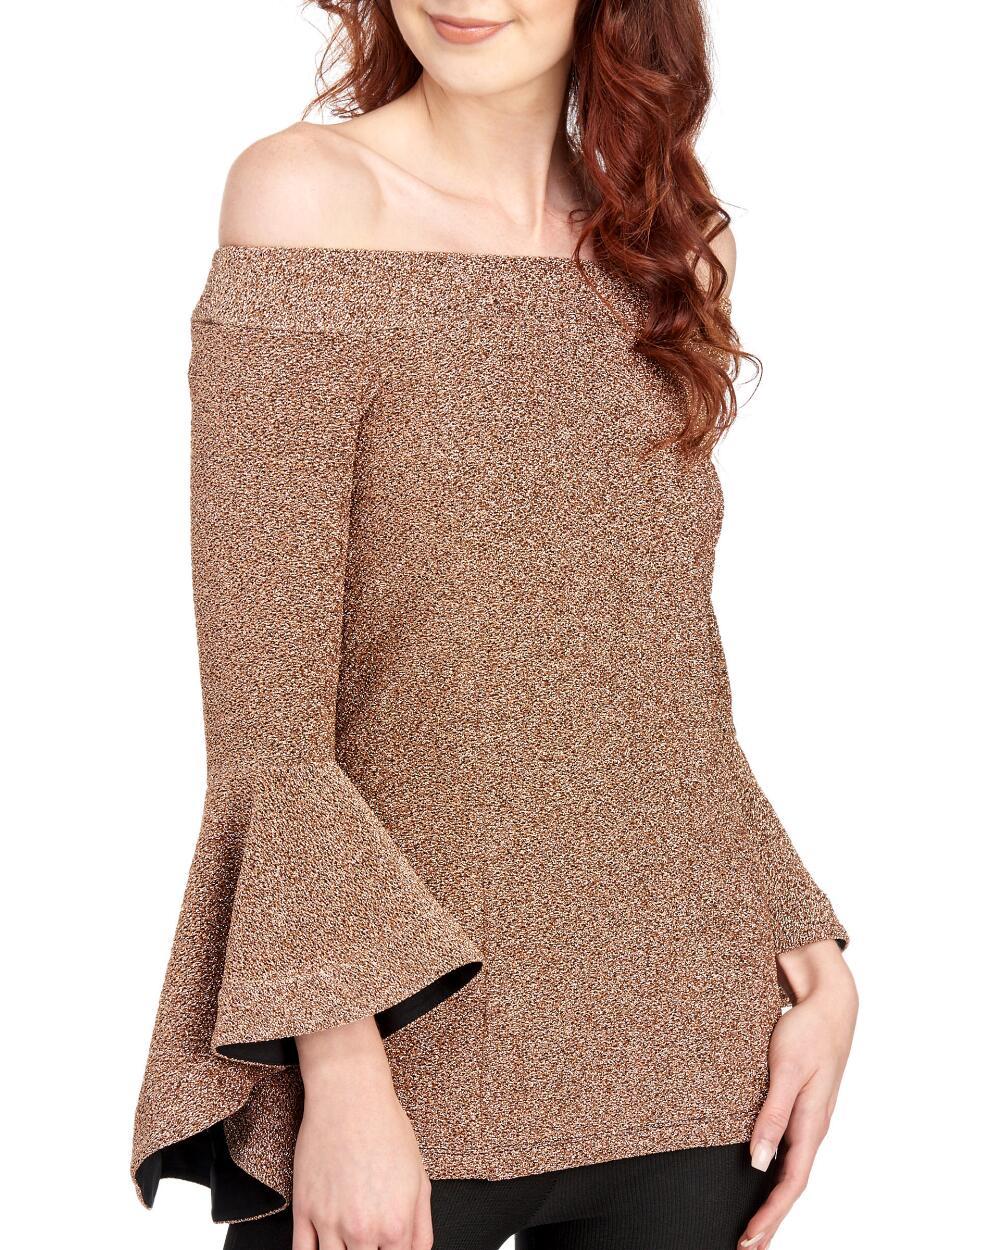 Discount Women S Formal Wear Elegant Evening Dresses Stein Mart Formal Wear Women Evening Dresses Elegant Clothes [ 1250 x 1000 Pixel ]